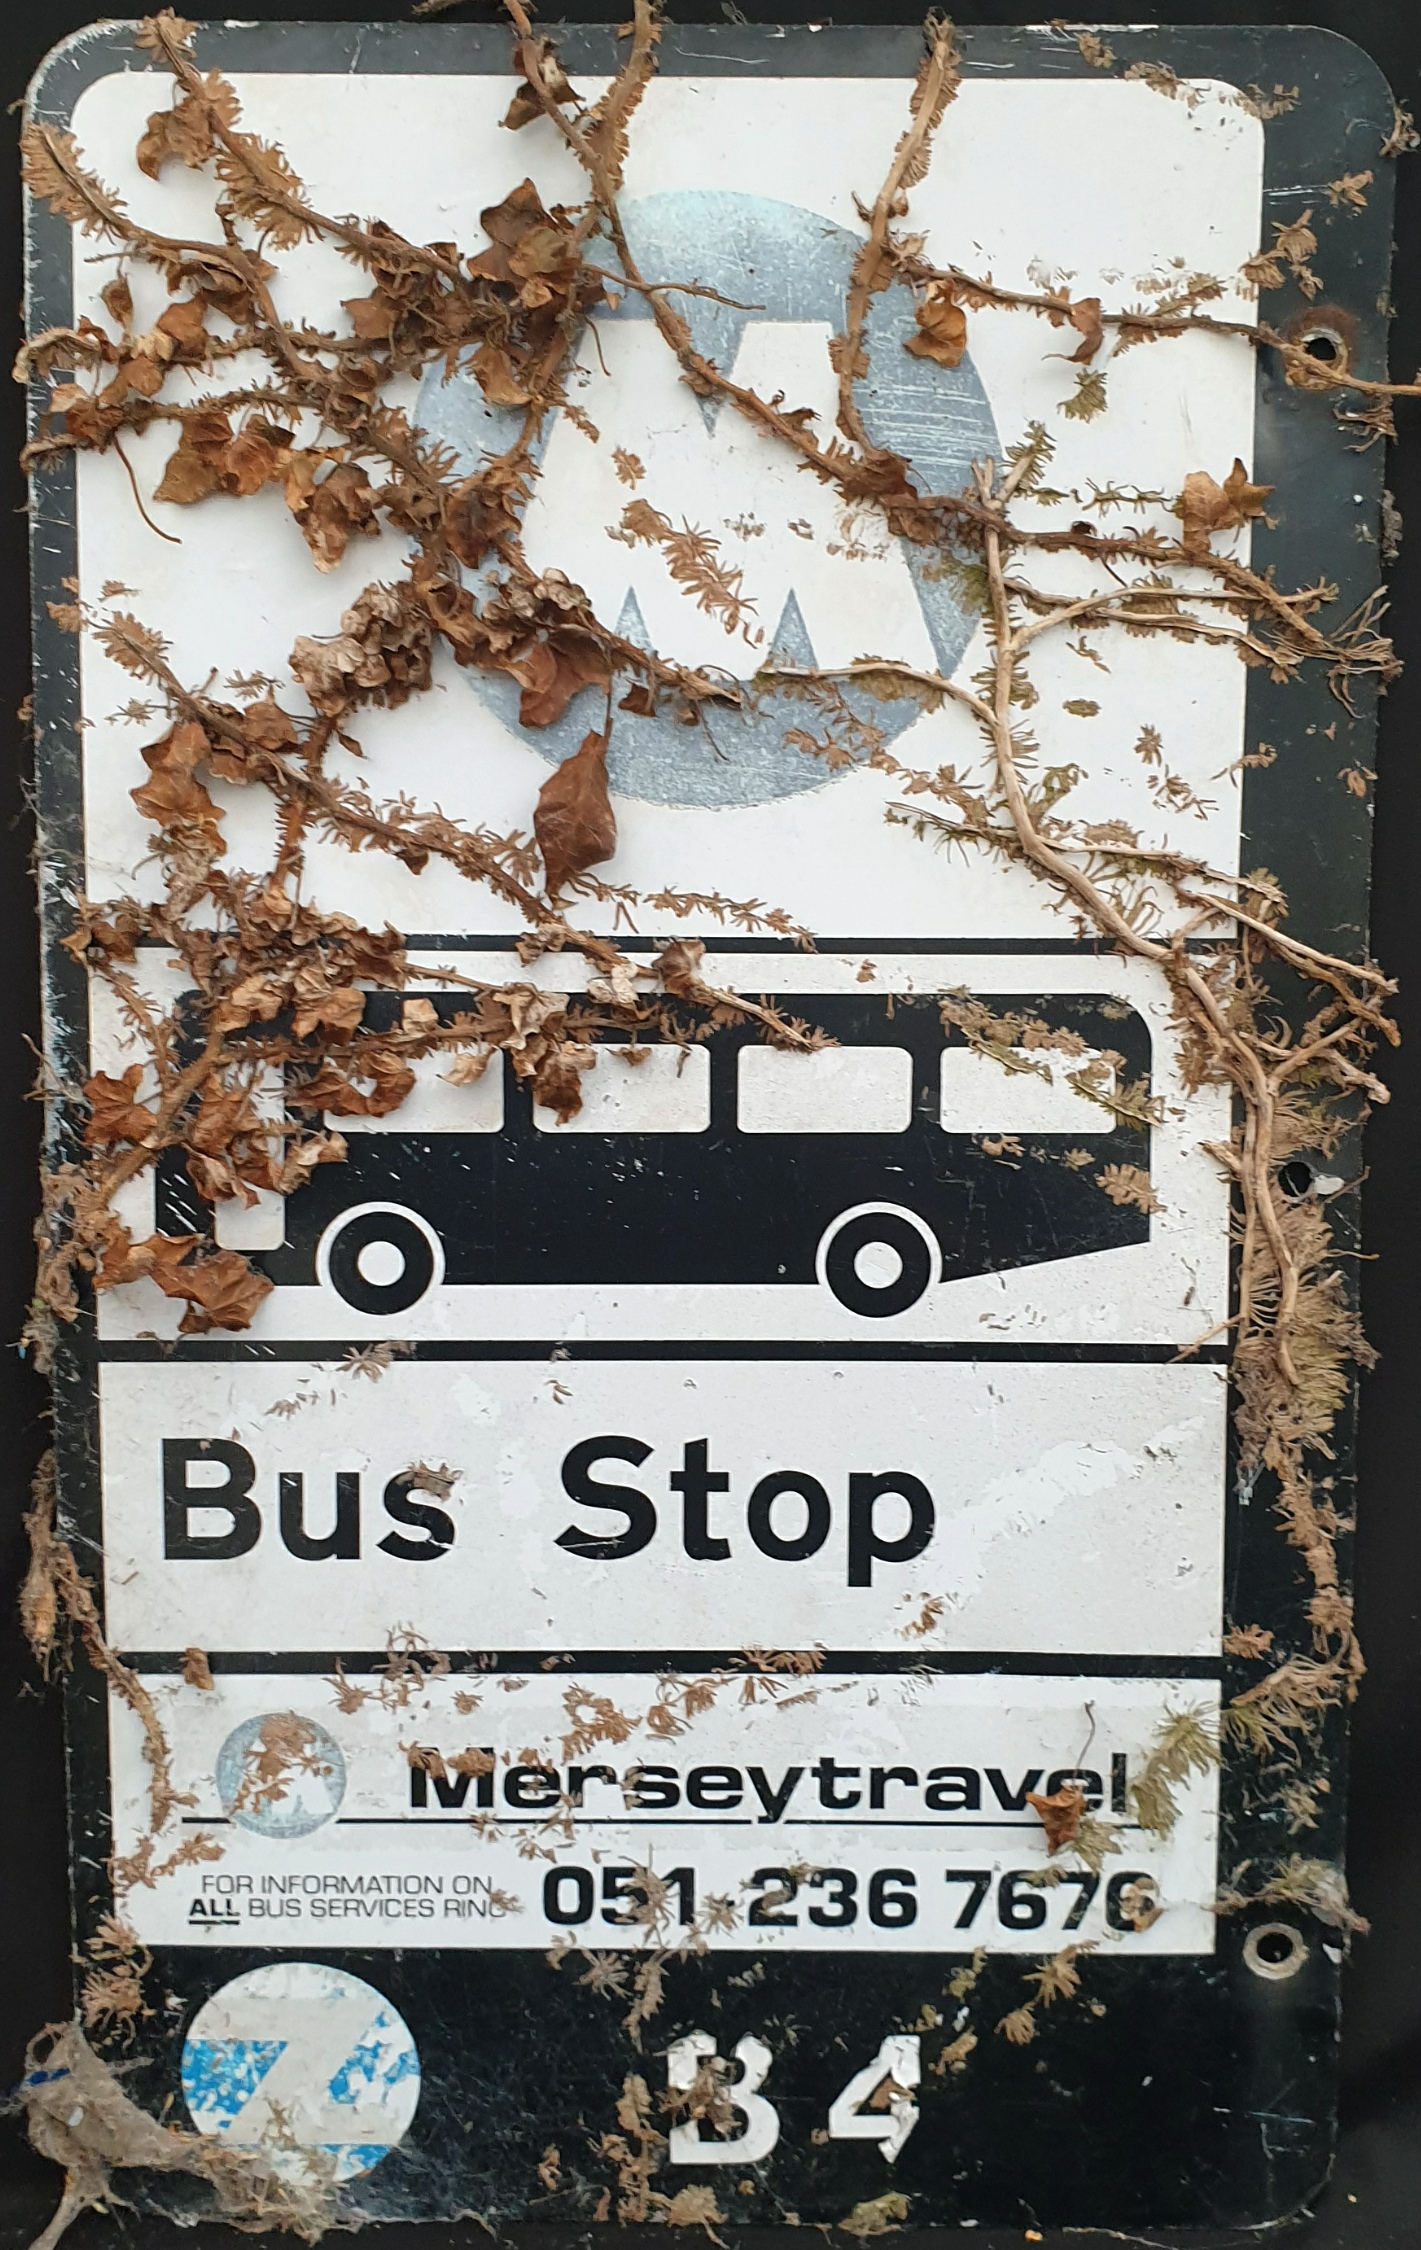 Vintage Retro Metal Mersey Travel Bus Stop Sign - Image 2 of 2